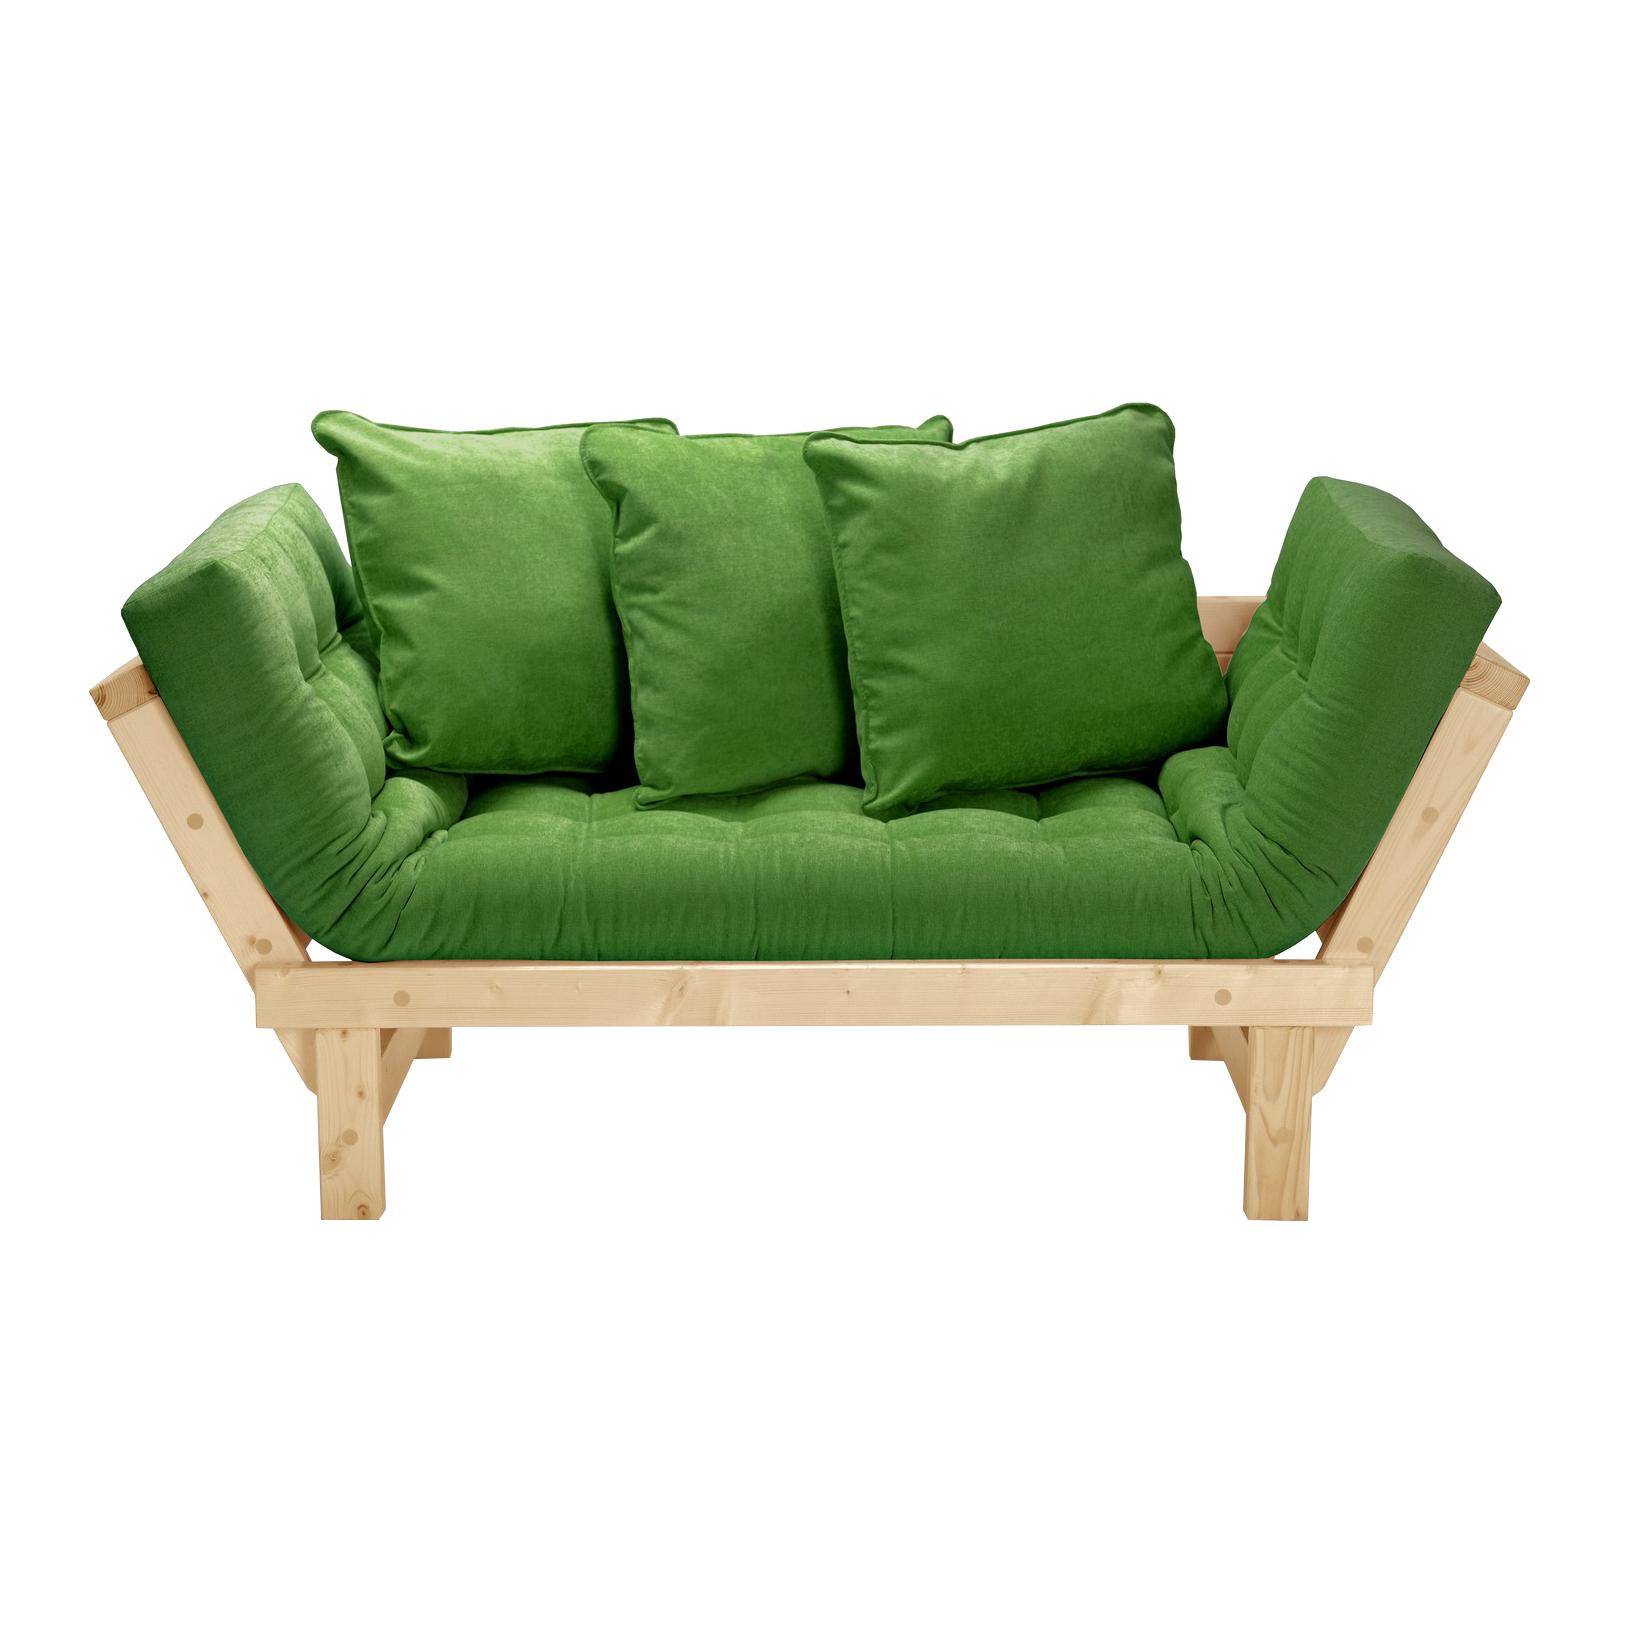 Кушетка AS Санди 158x77x61 сосна/зеленый кушетки